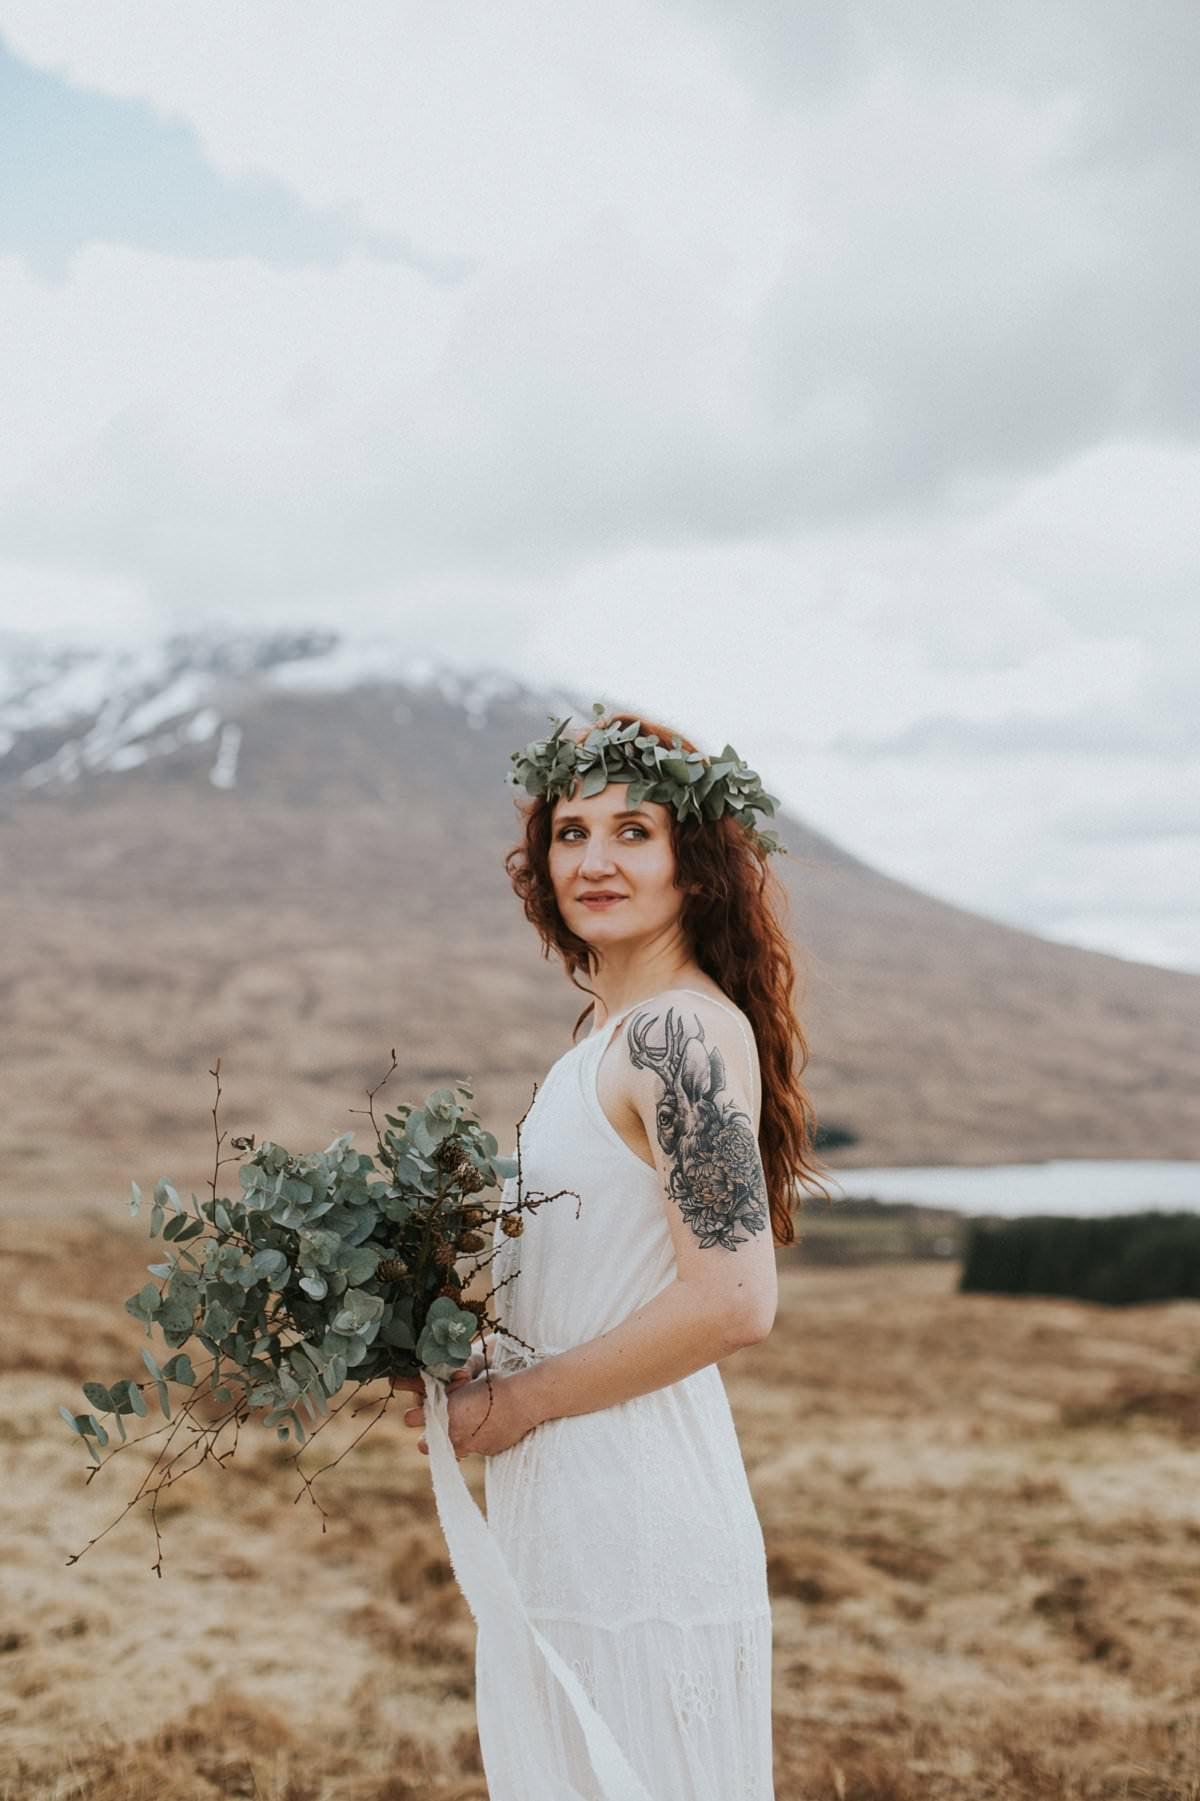 fine-art-elopement-wedding-photography-glencoe-058